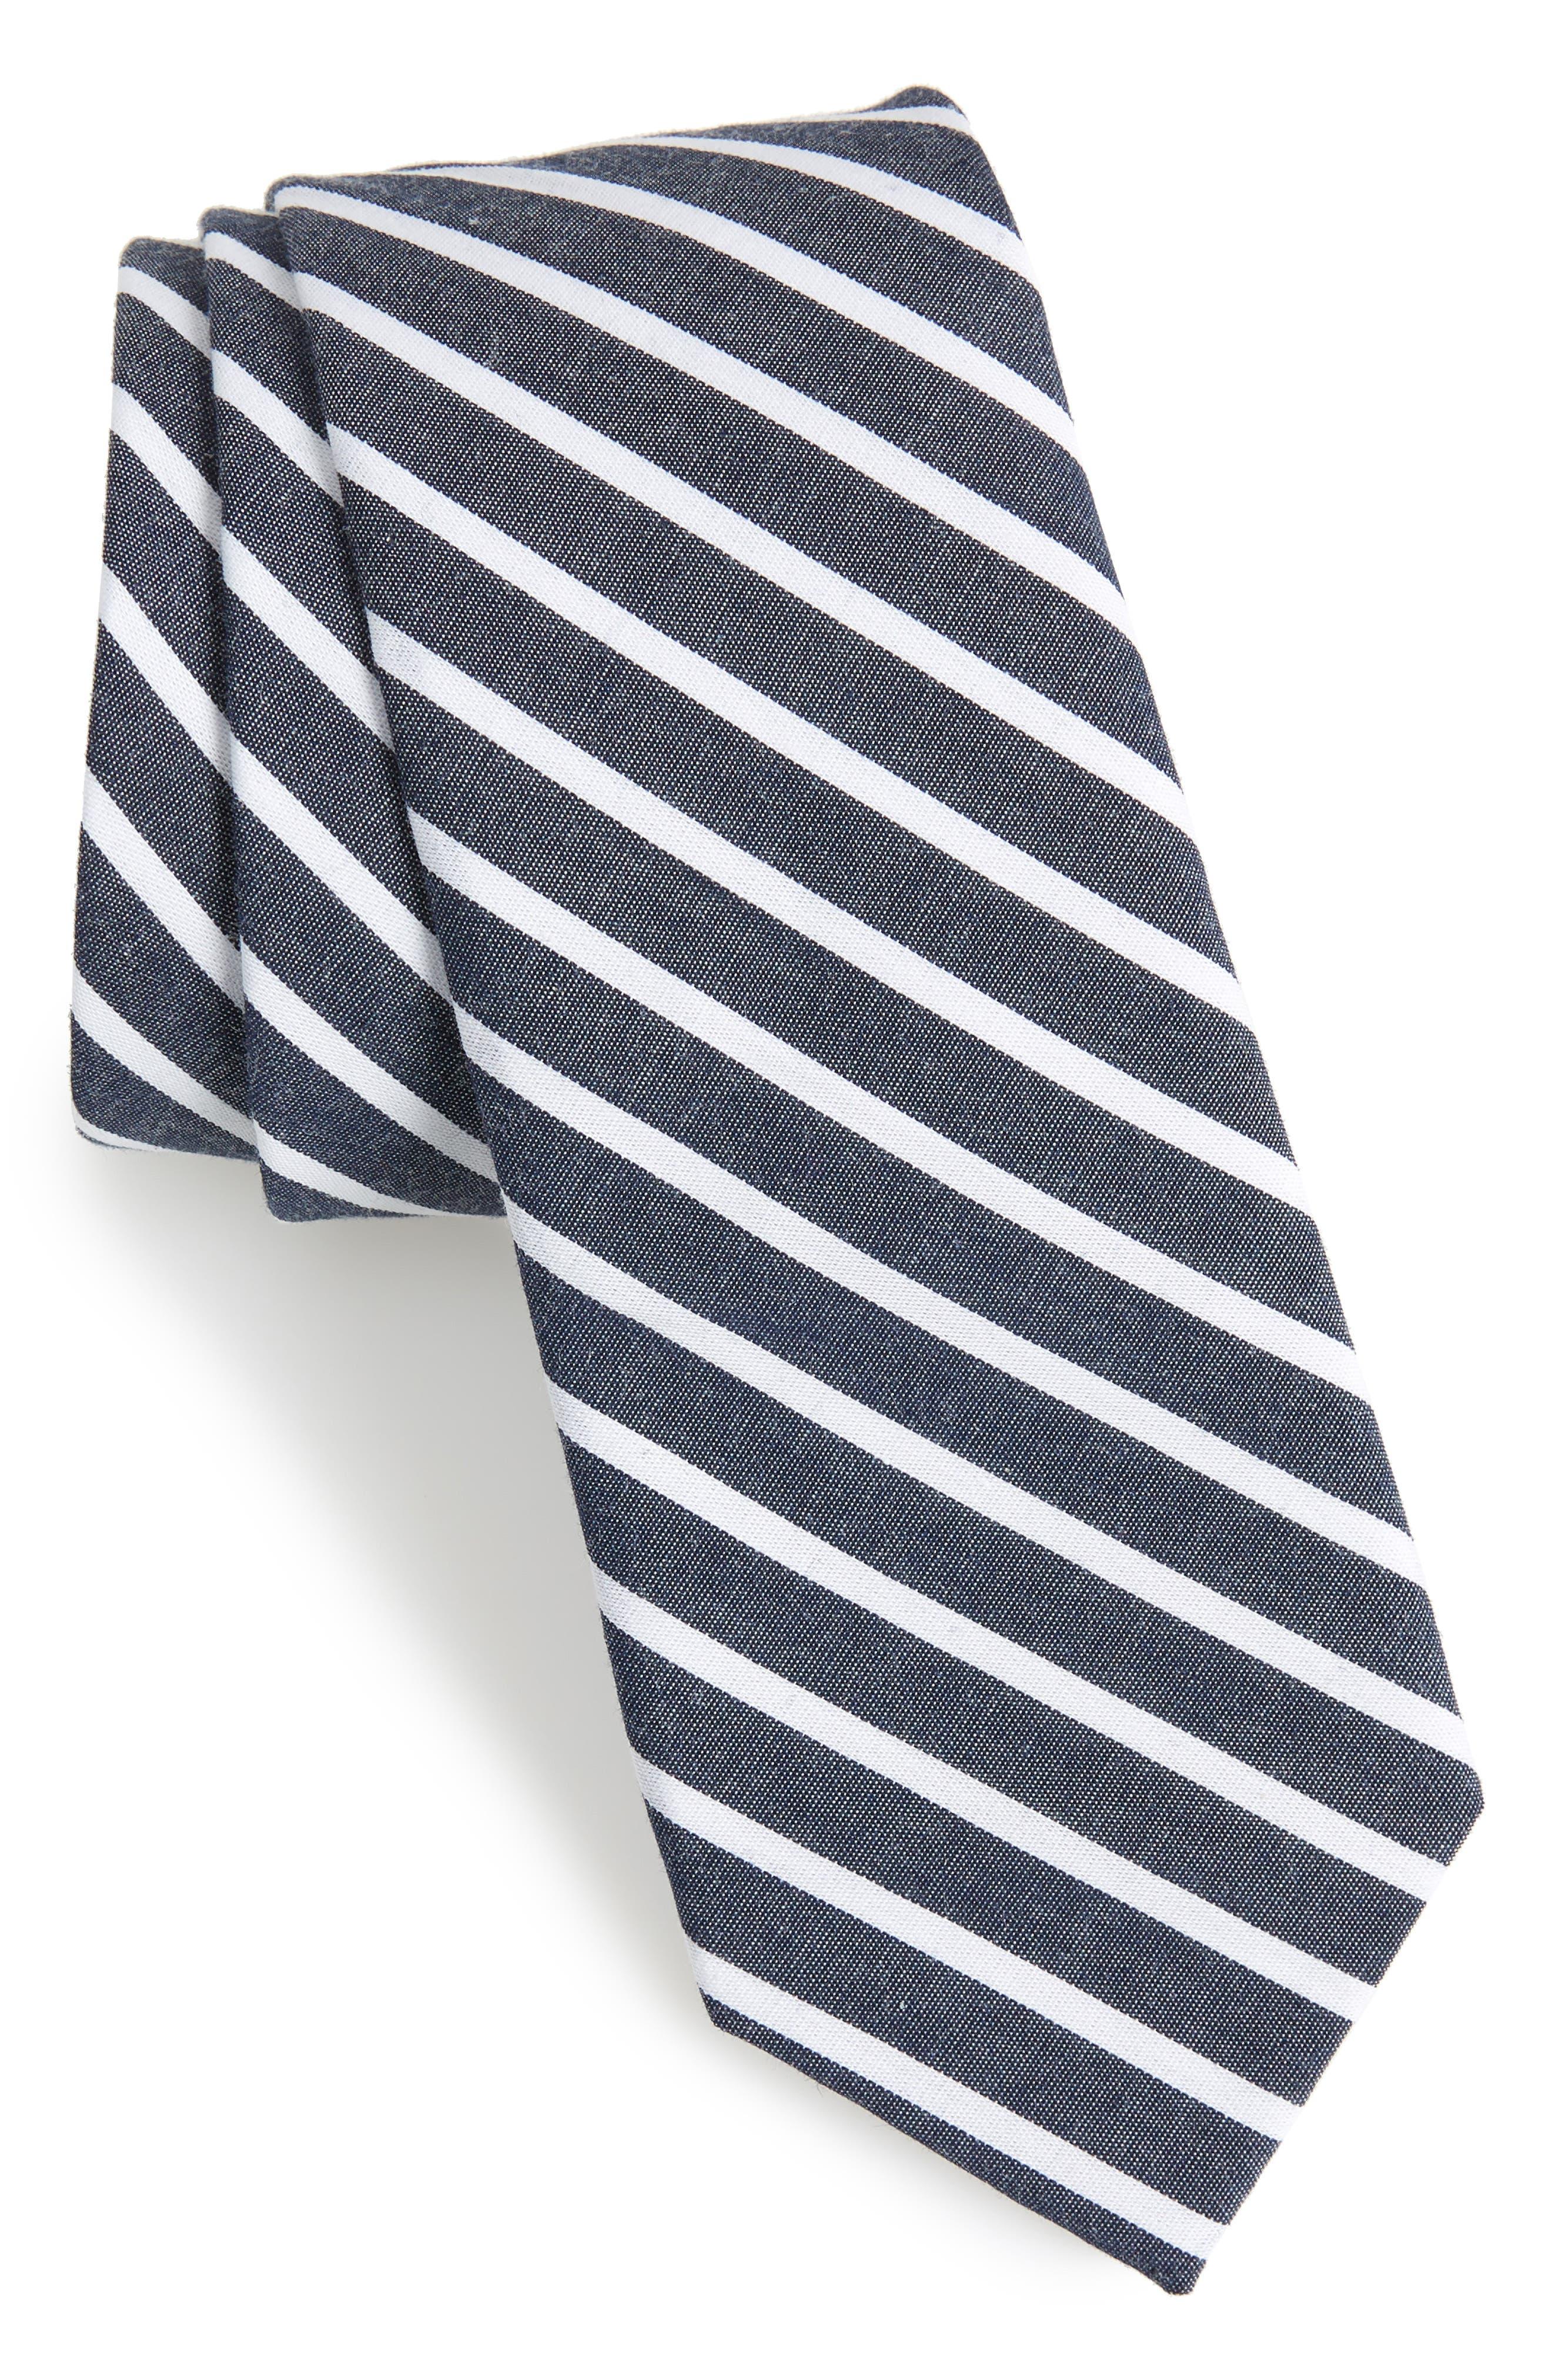 Holborn Stripe Cotton Skinny Tie,                         Main,                         color, Navy